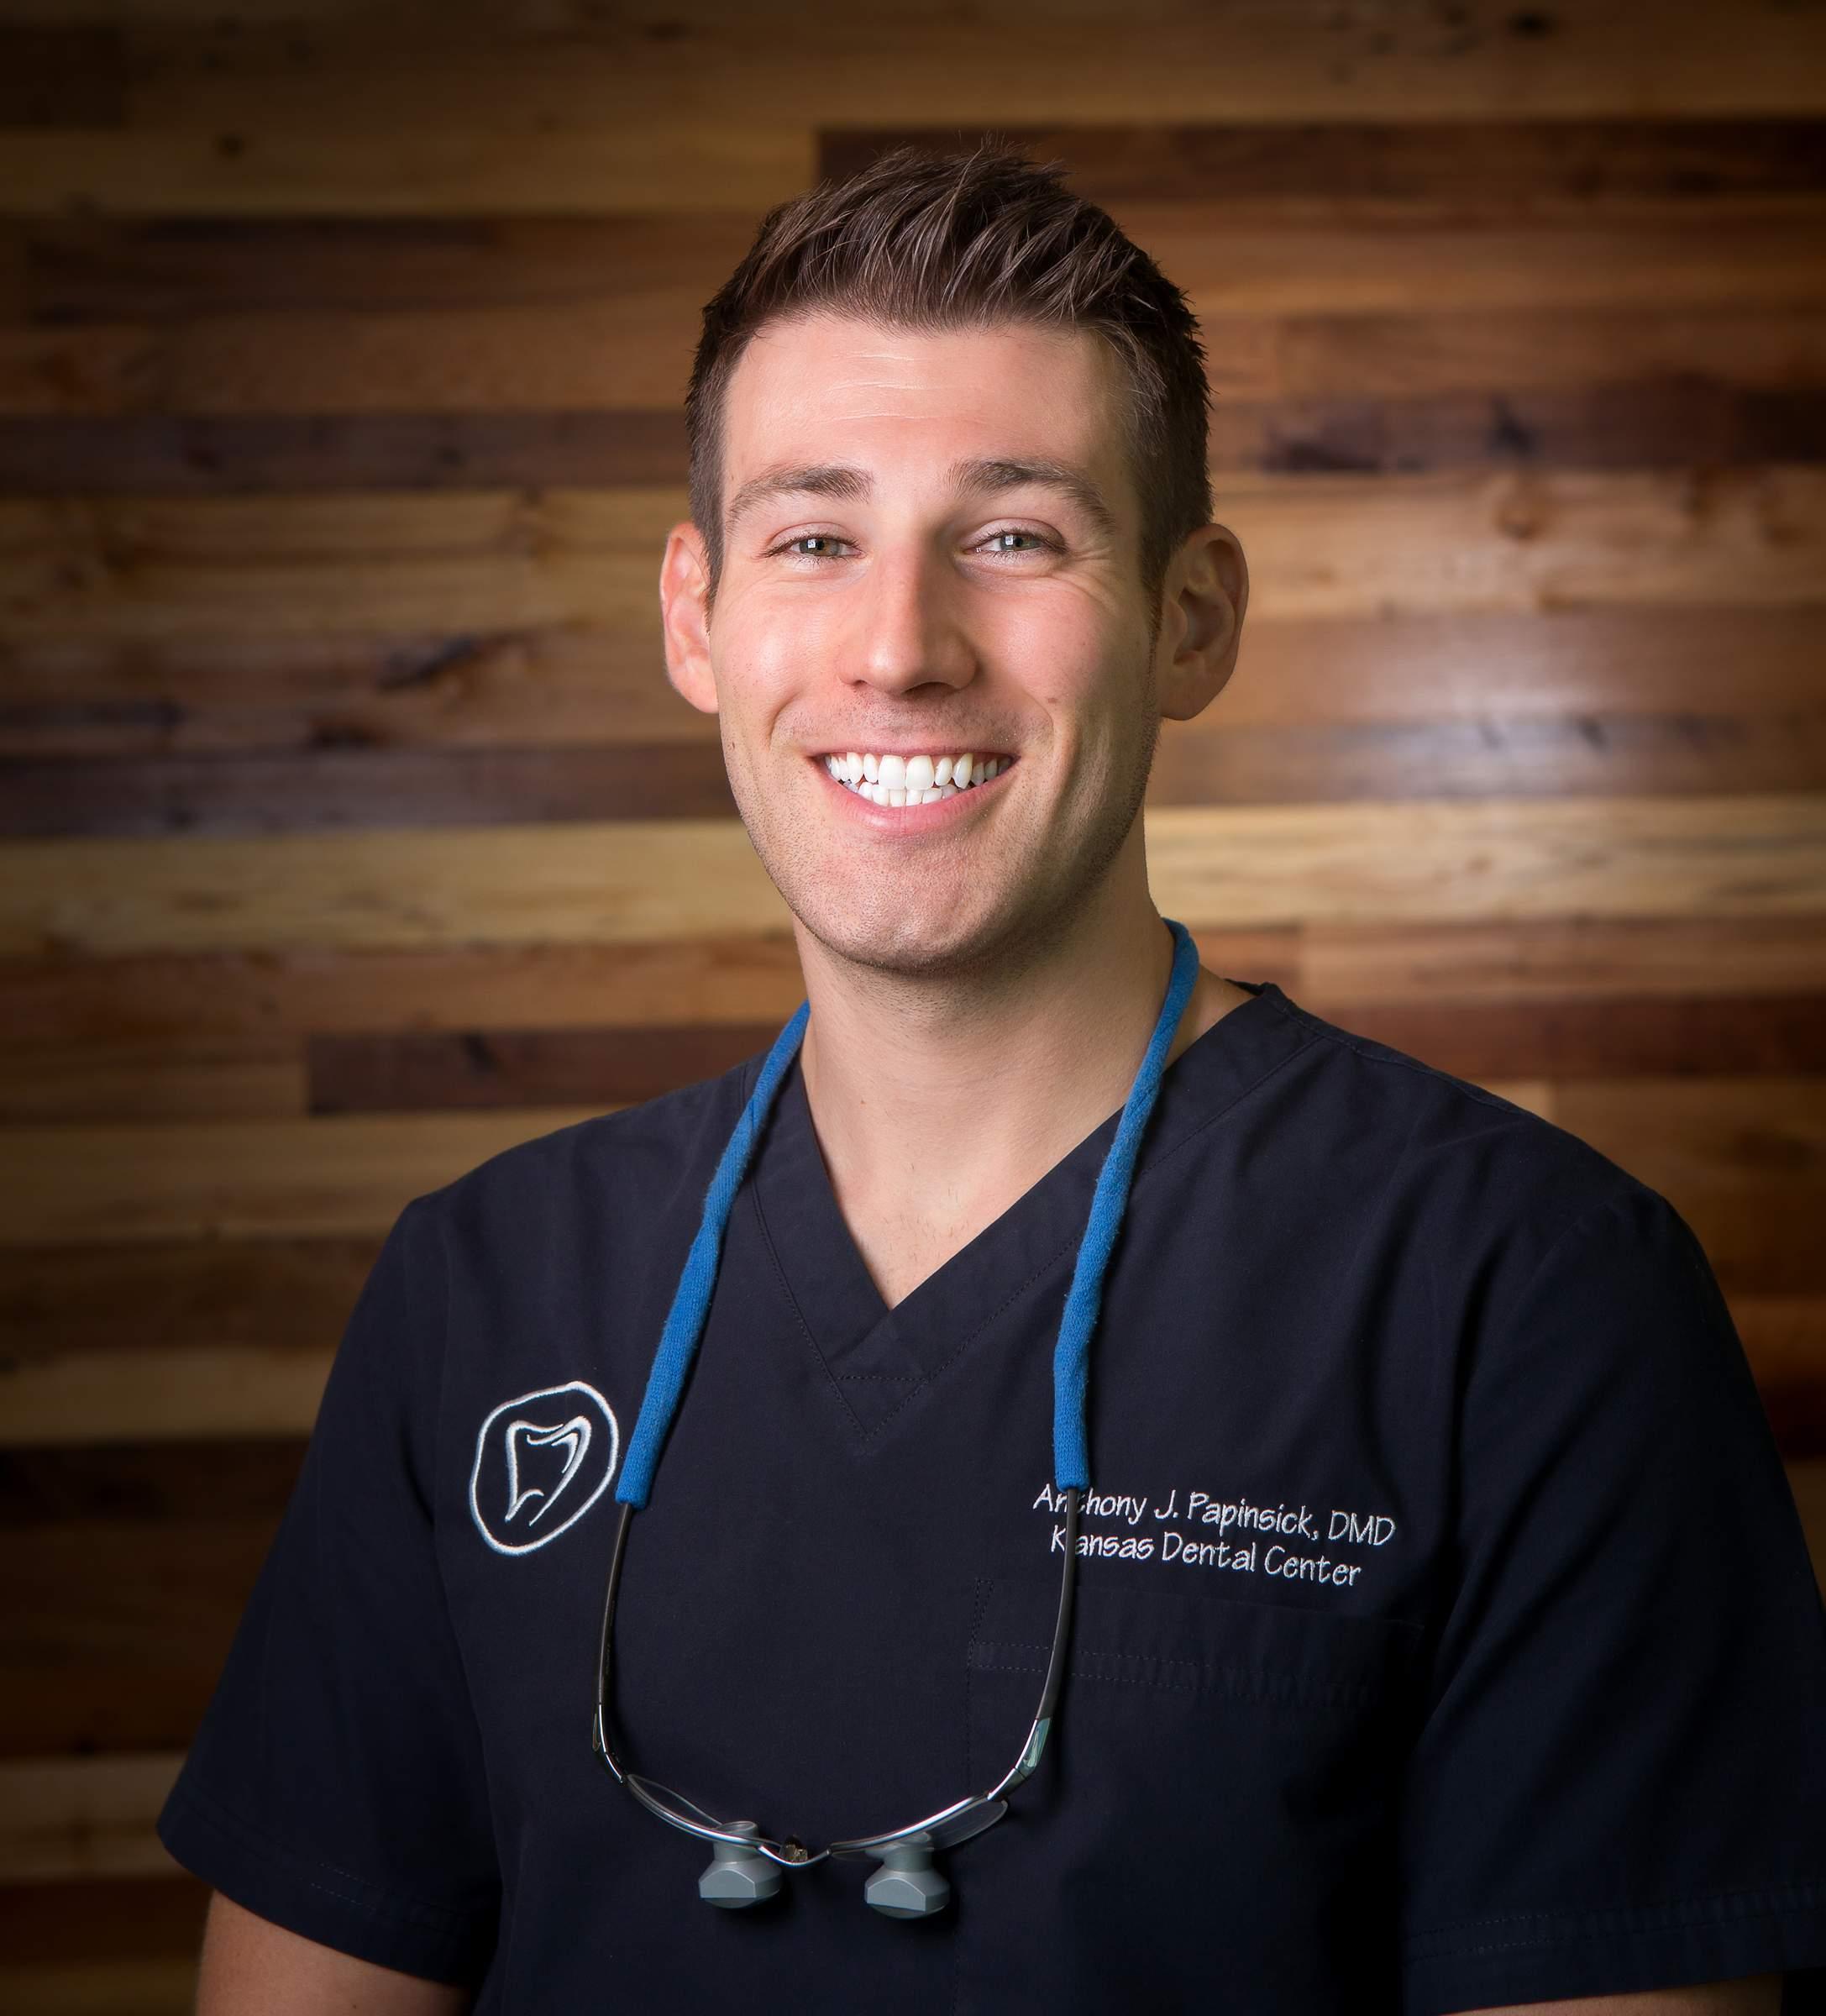 Dental Doctor portrait photographer Tom Schmidt WalkThru360